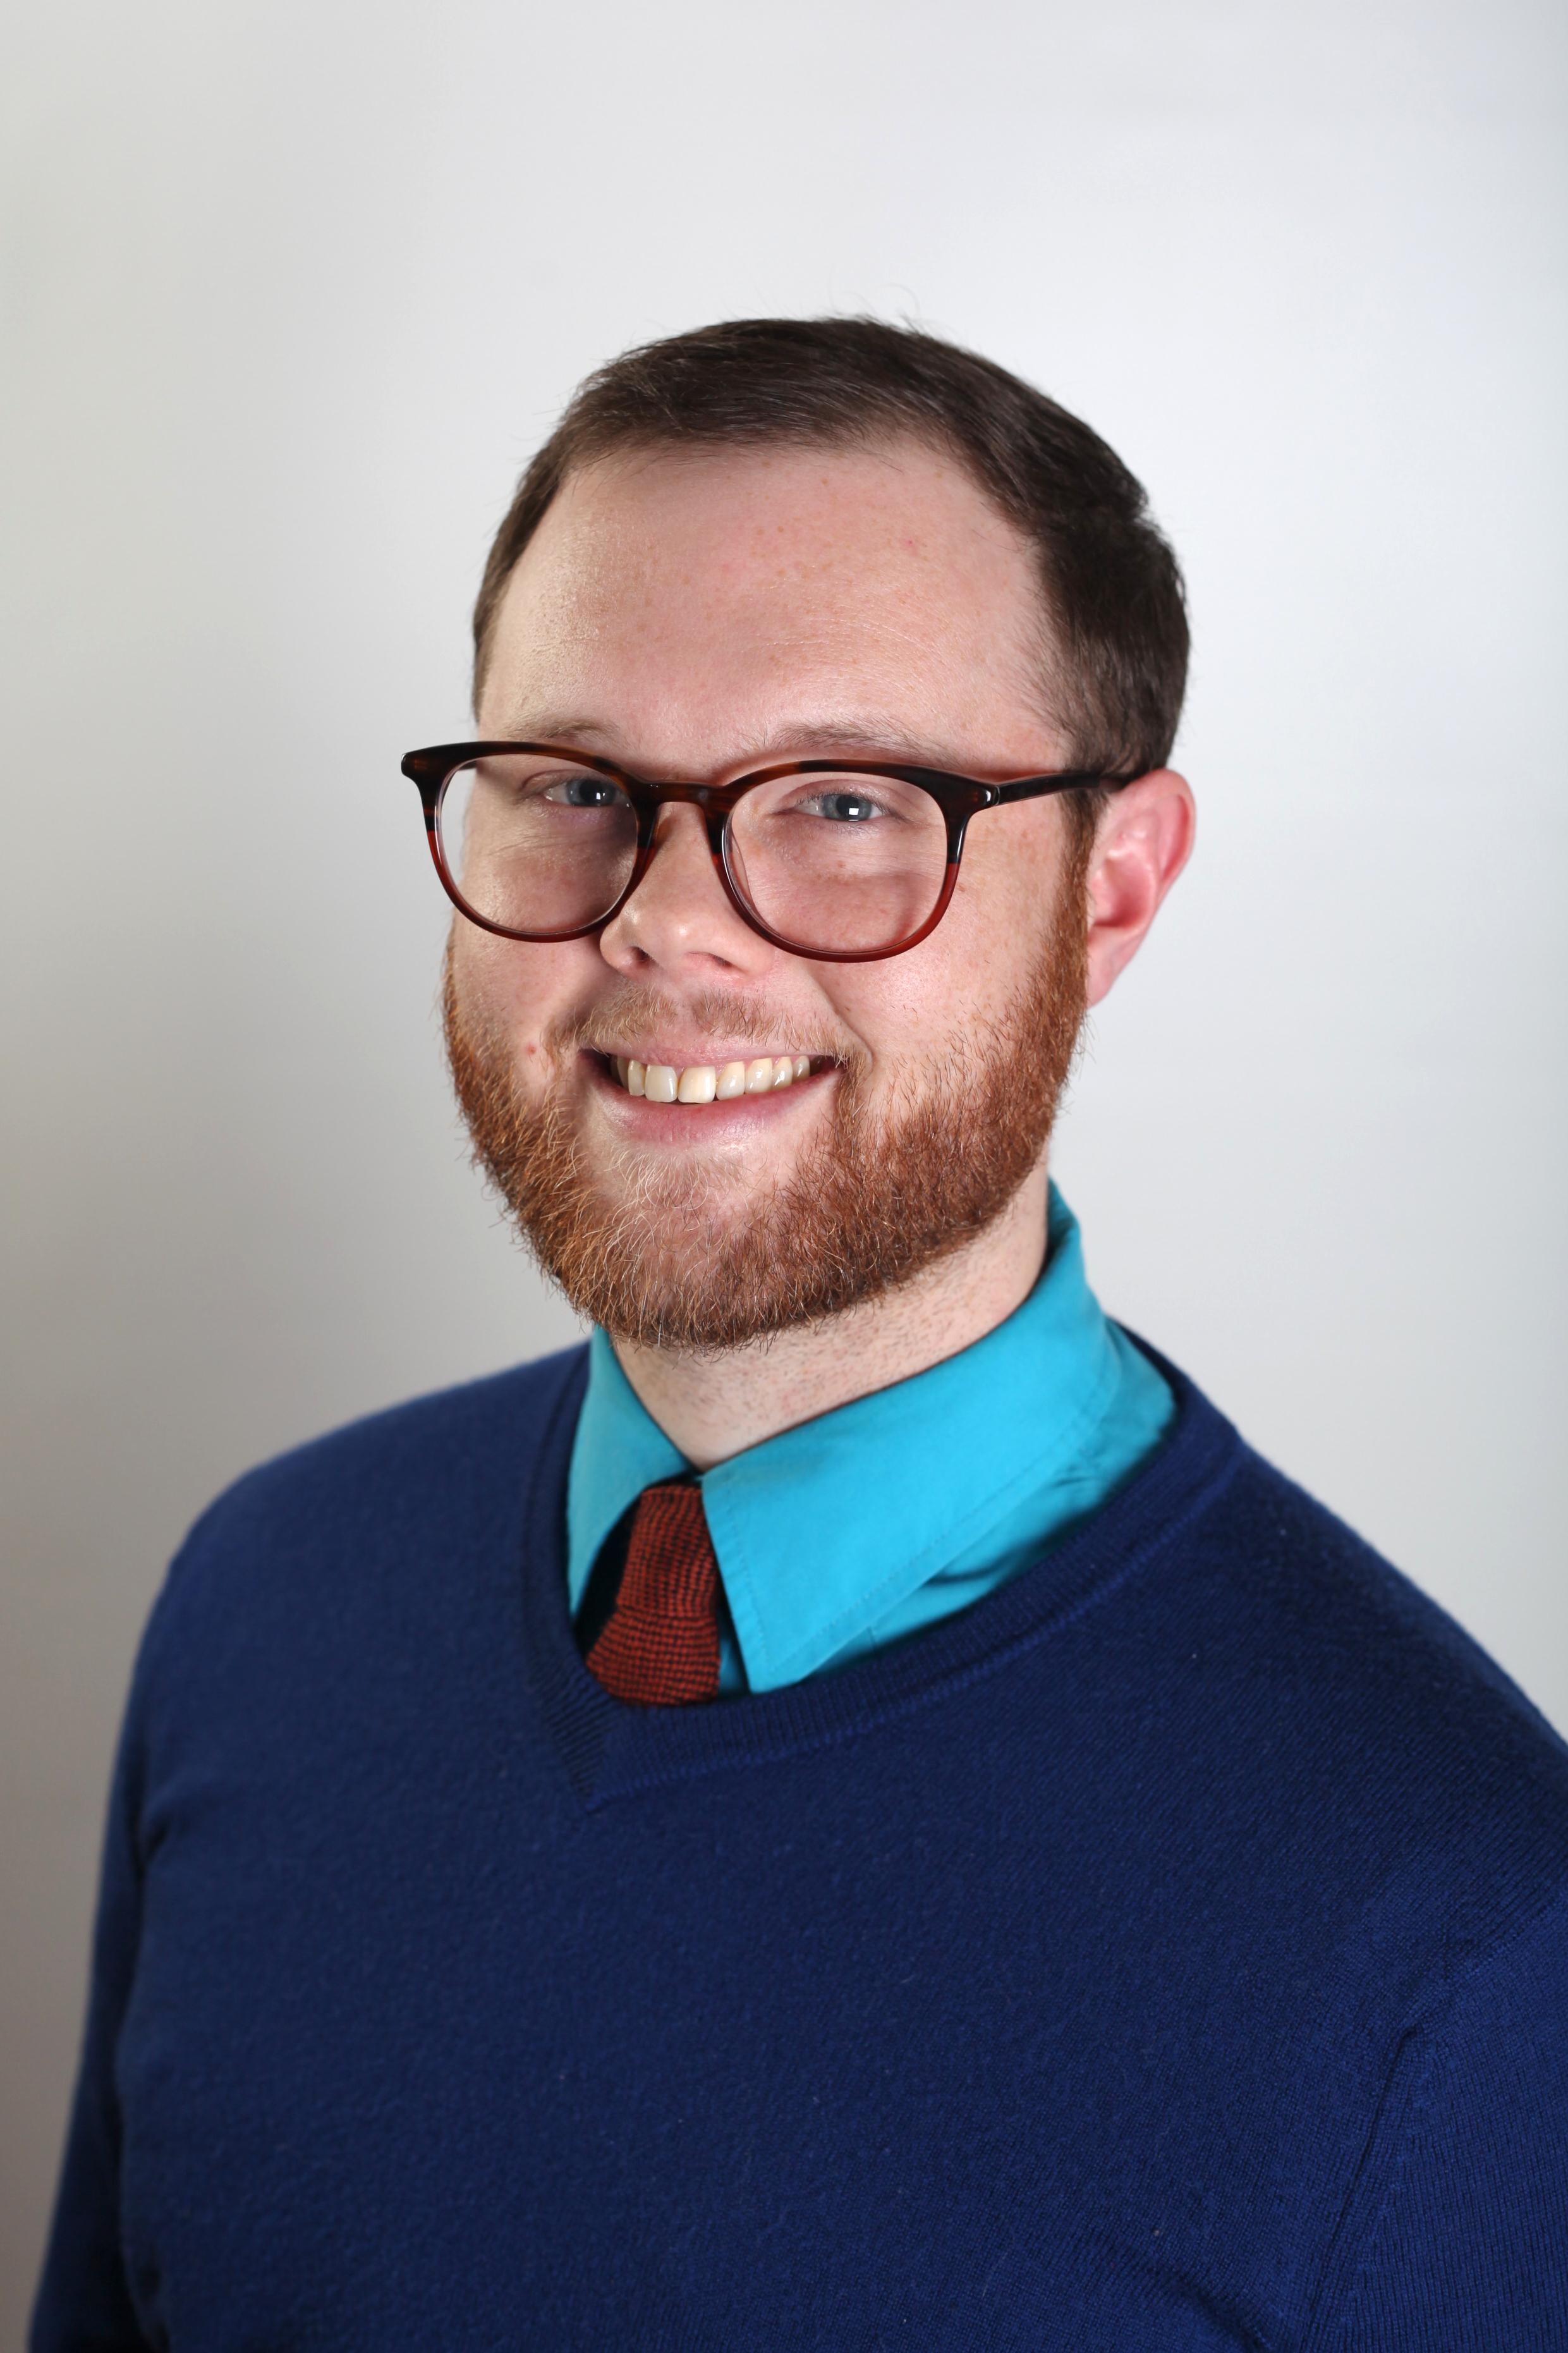 Scott Artley head shot by RJL Photography 29.jpg